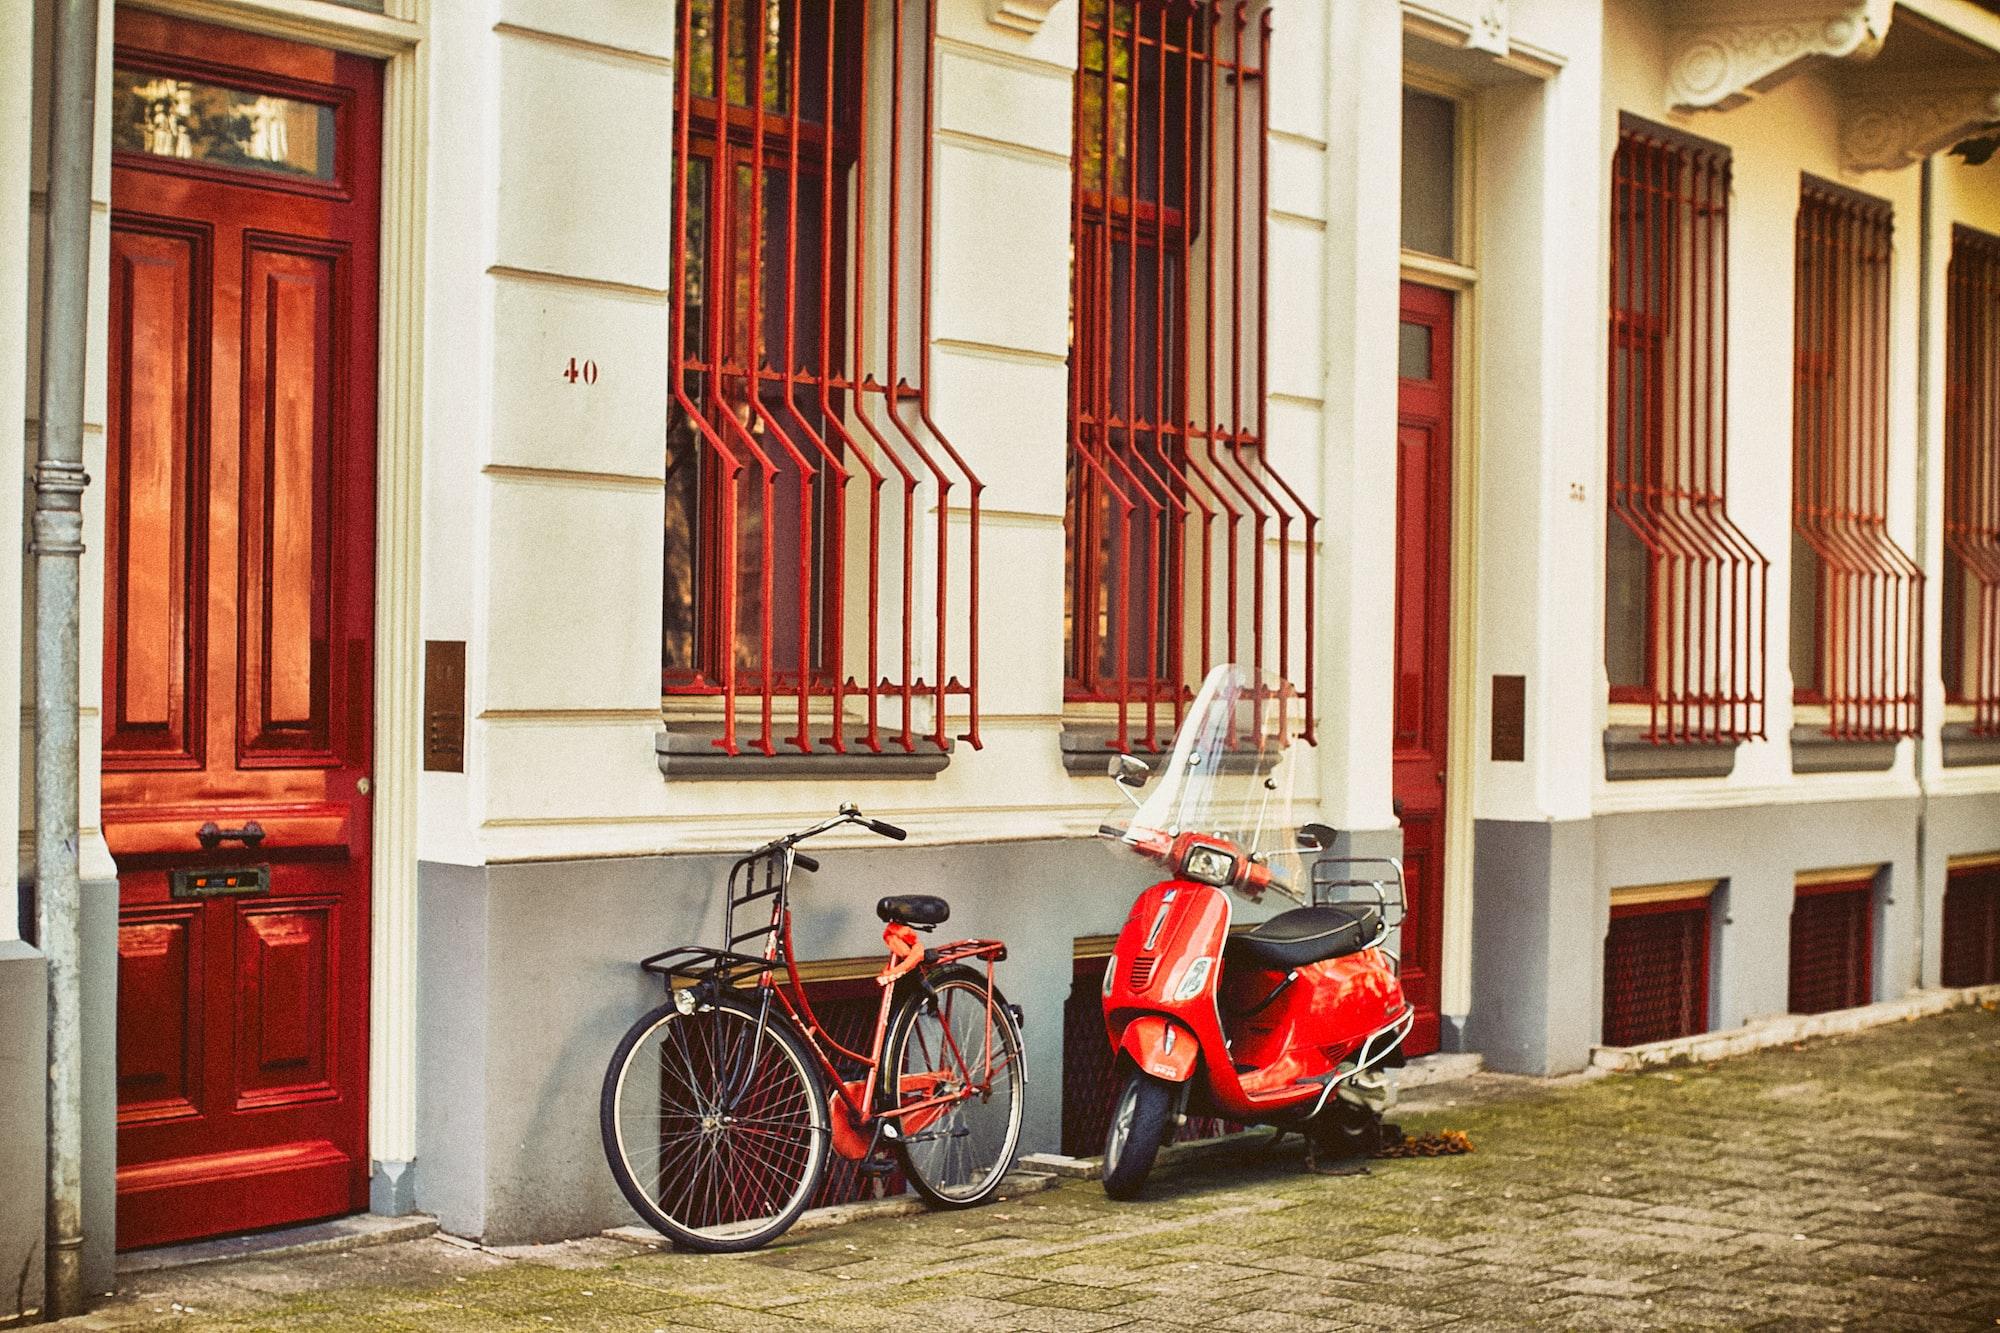 The economics of mobility [Datata #5]